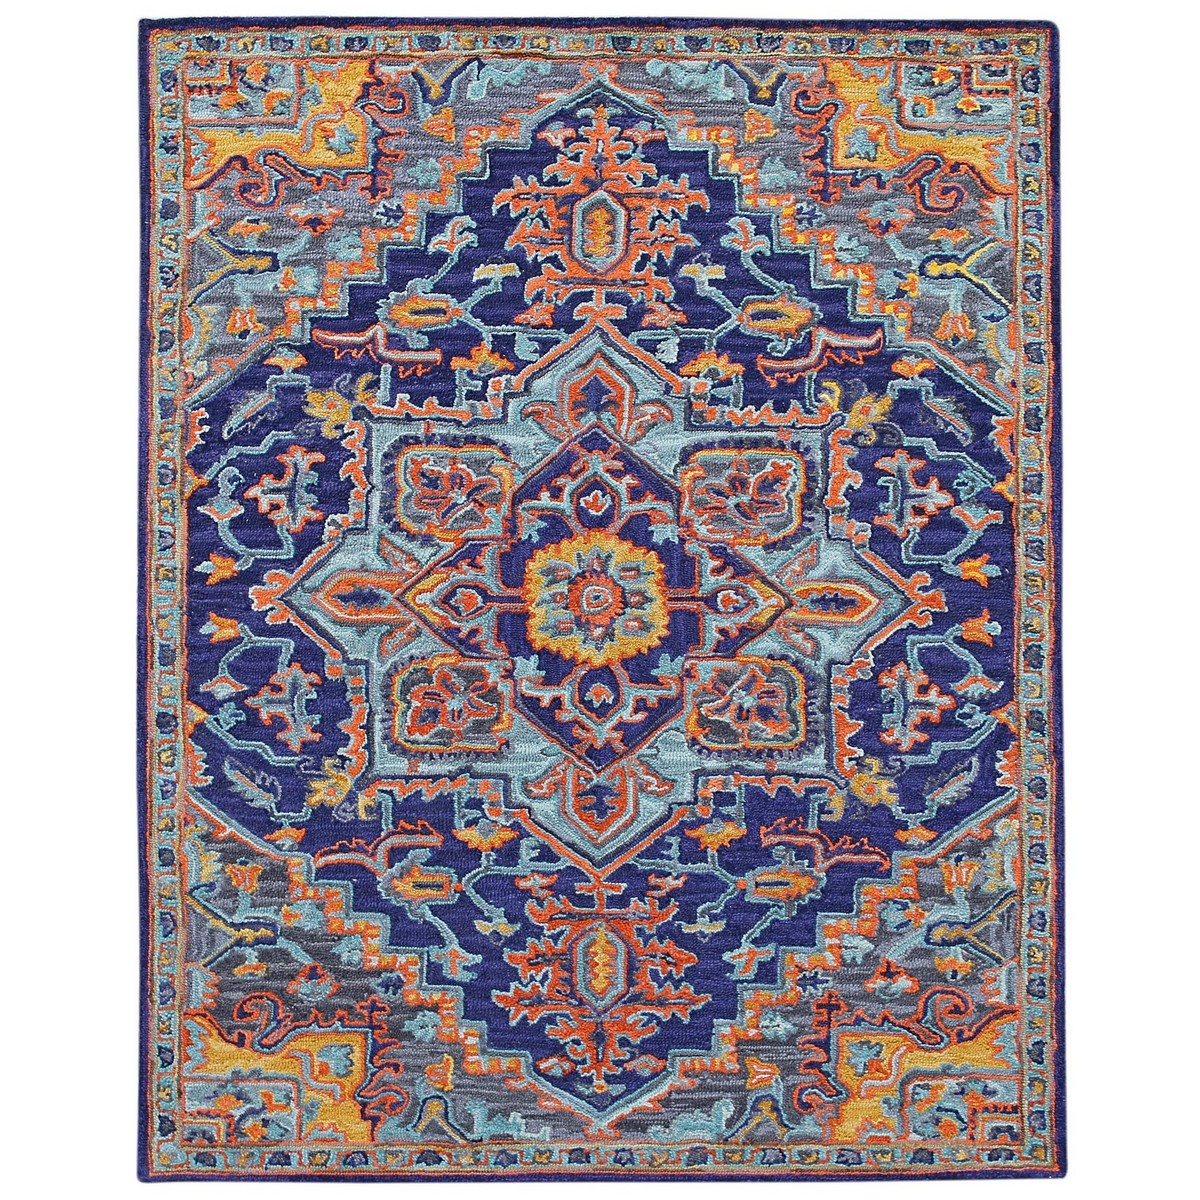 Boho Hand Tuffted Wool Rug, 160x230cm, Blue Violet